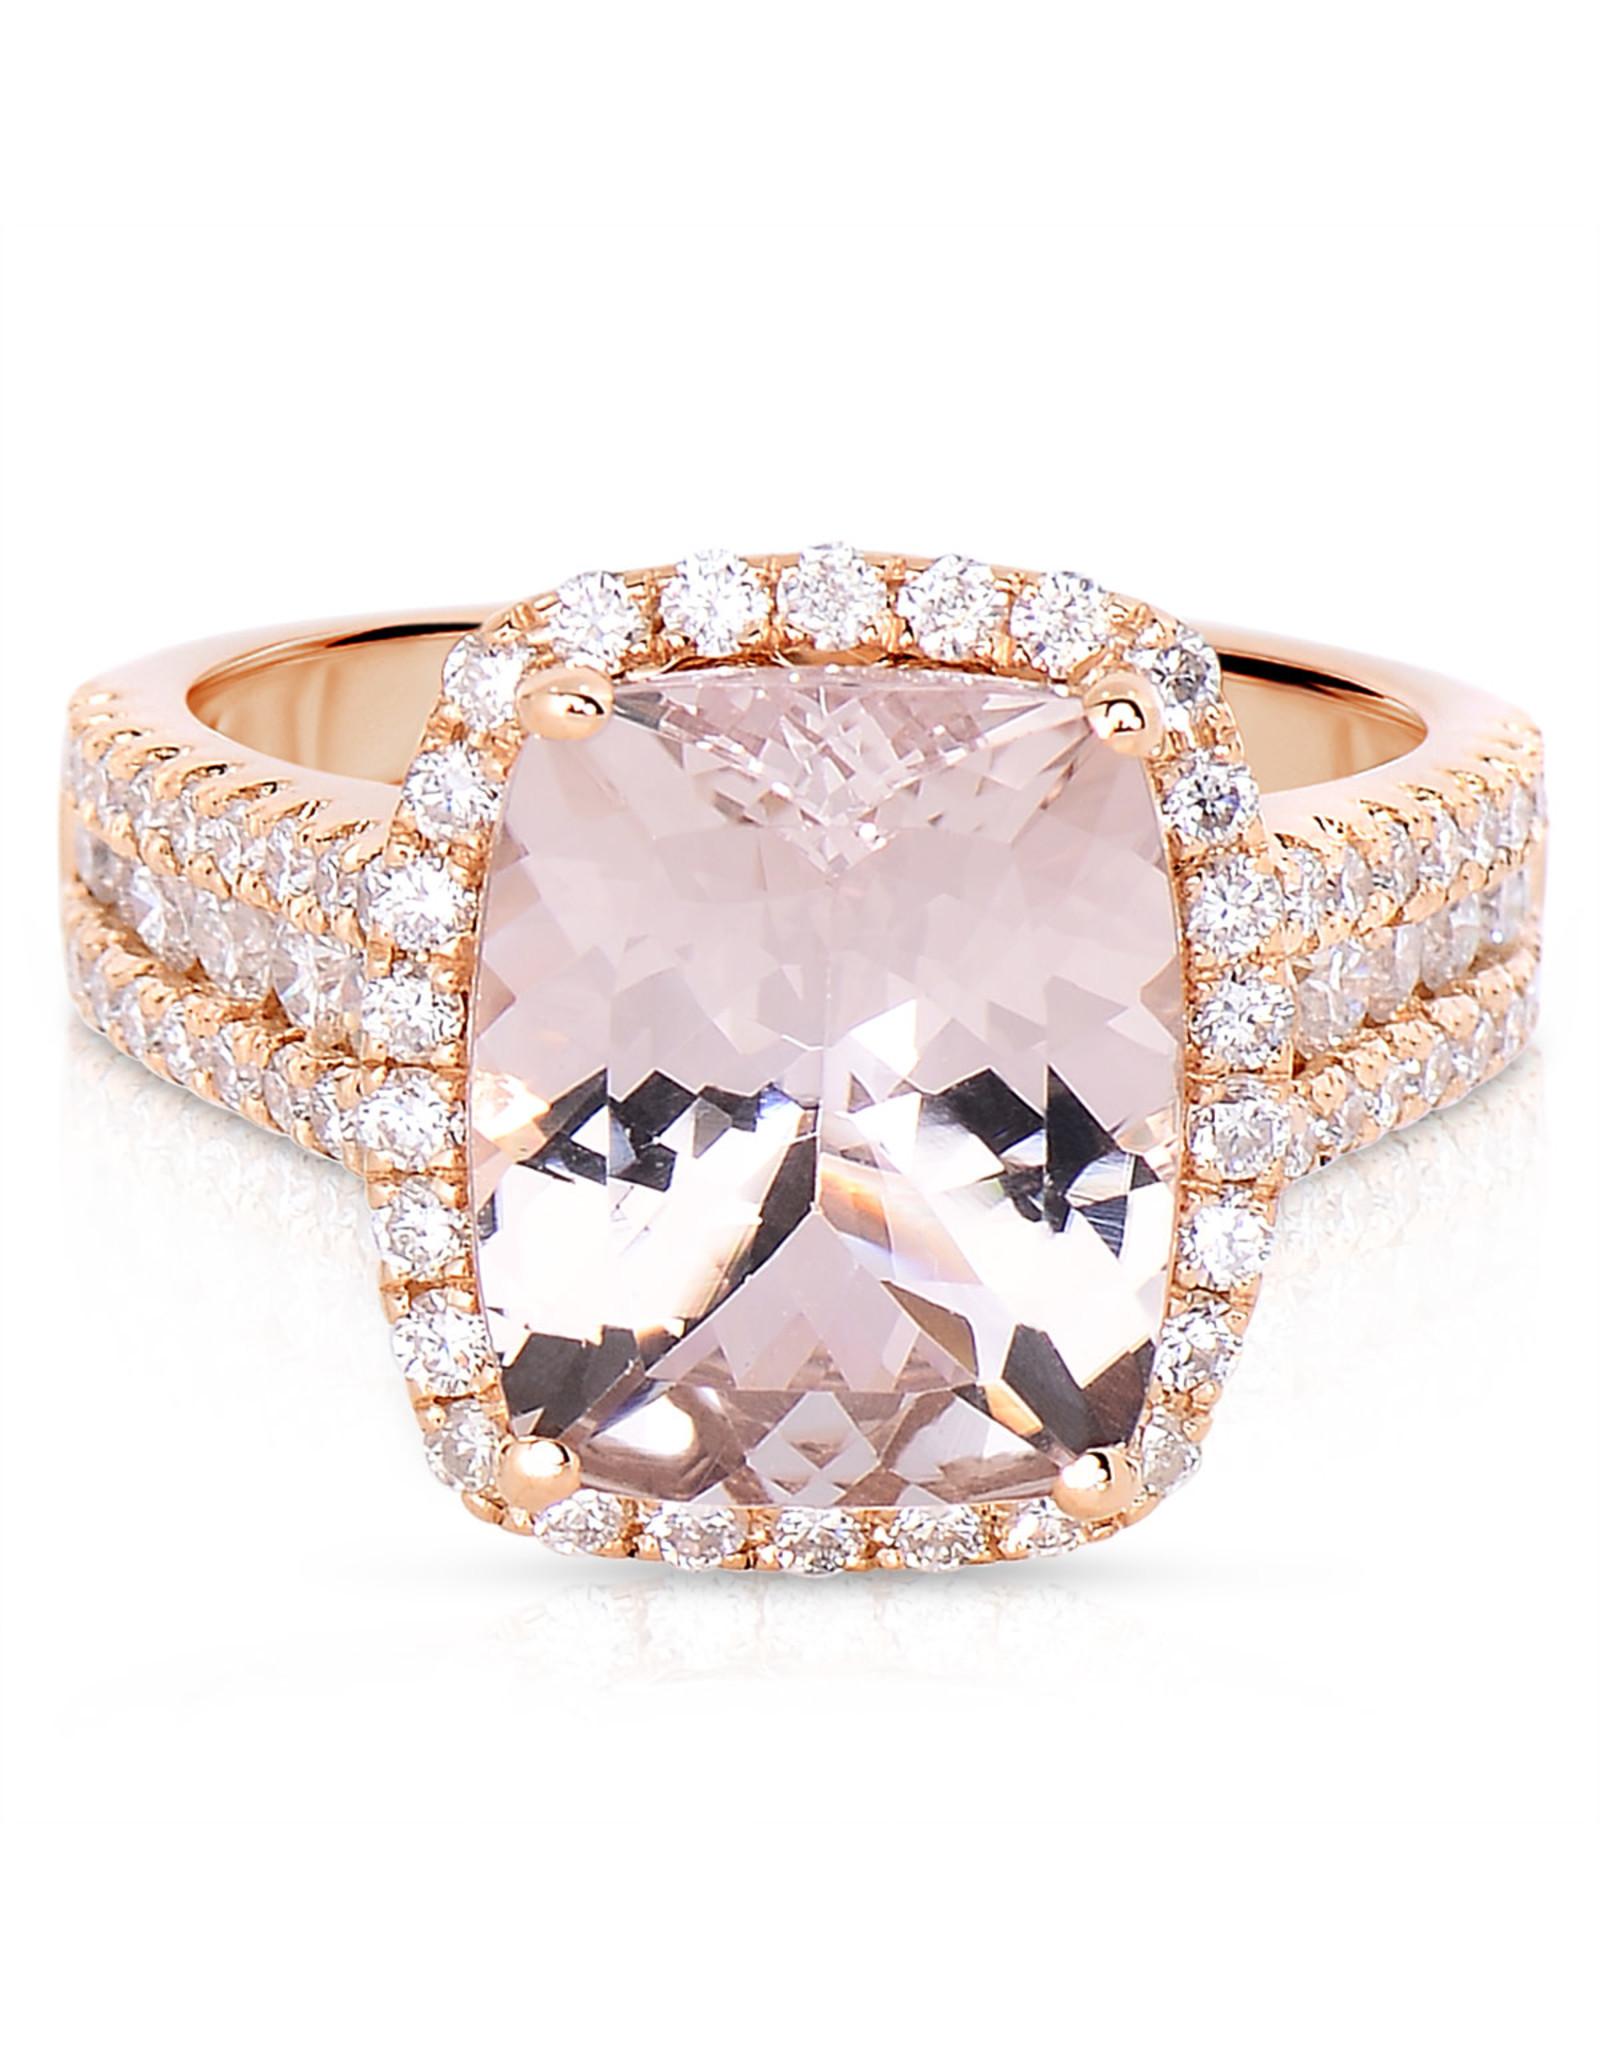 18K Rose Gold Morganite and Diamond Fashion Ring, M: 5.25ct, D: 1.21ct